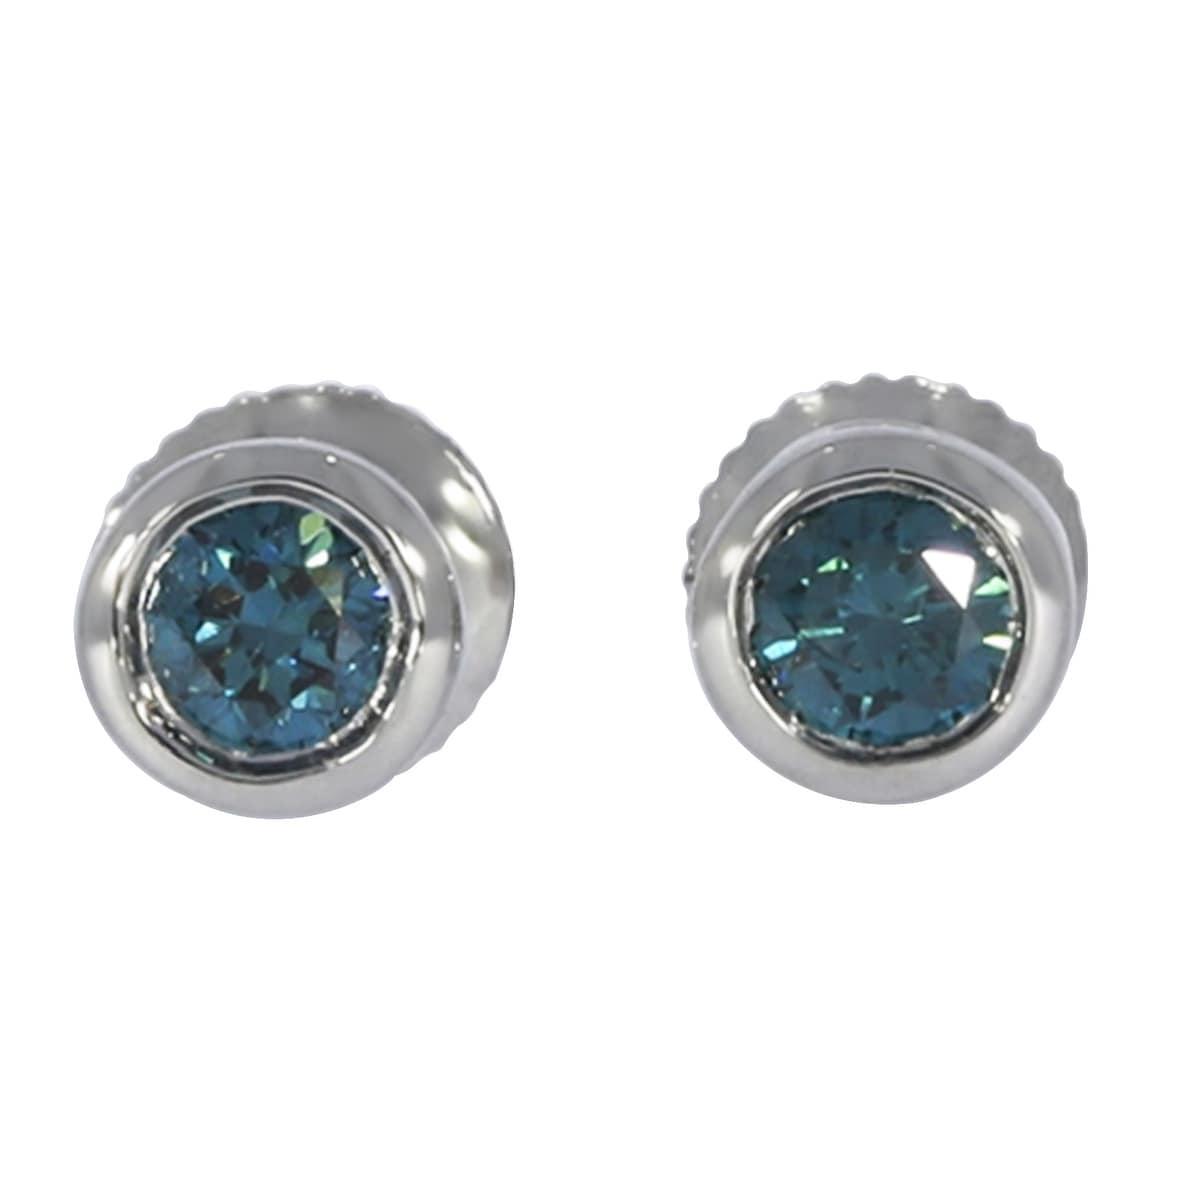 Prism Jewel Round Brilliant Cut Bezel Set Blue Diamond Screw Back Stud Earring - Thumbnail 0